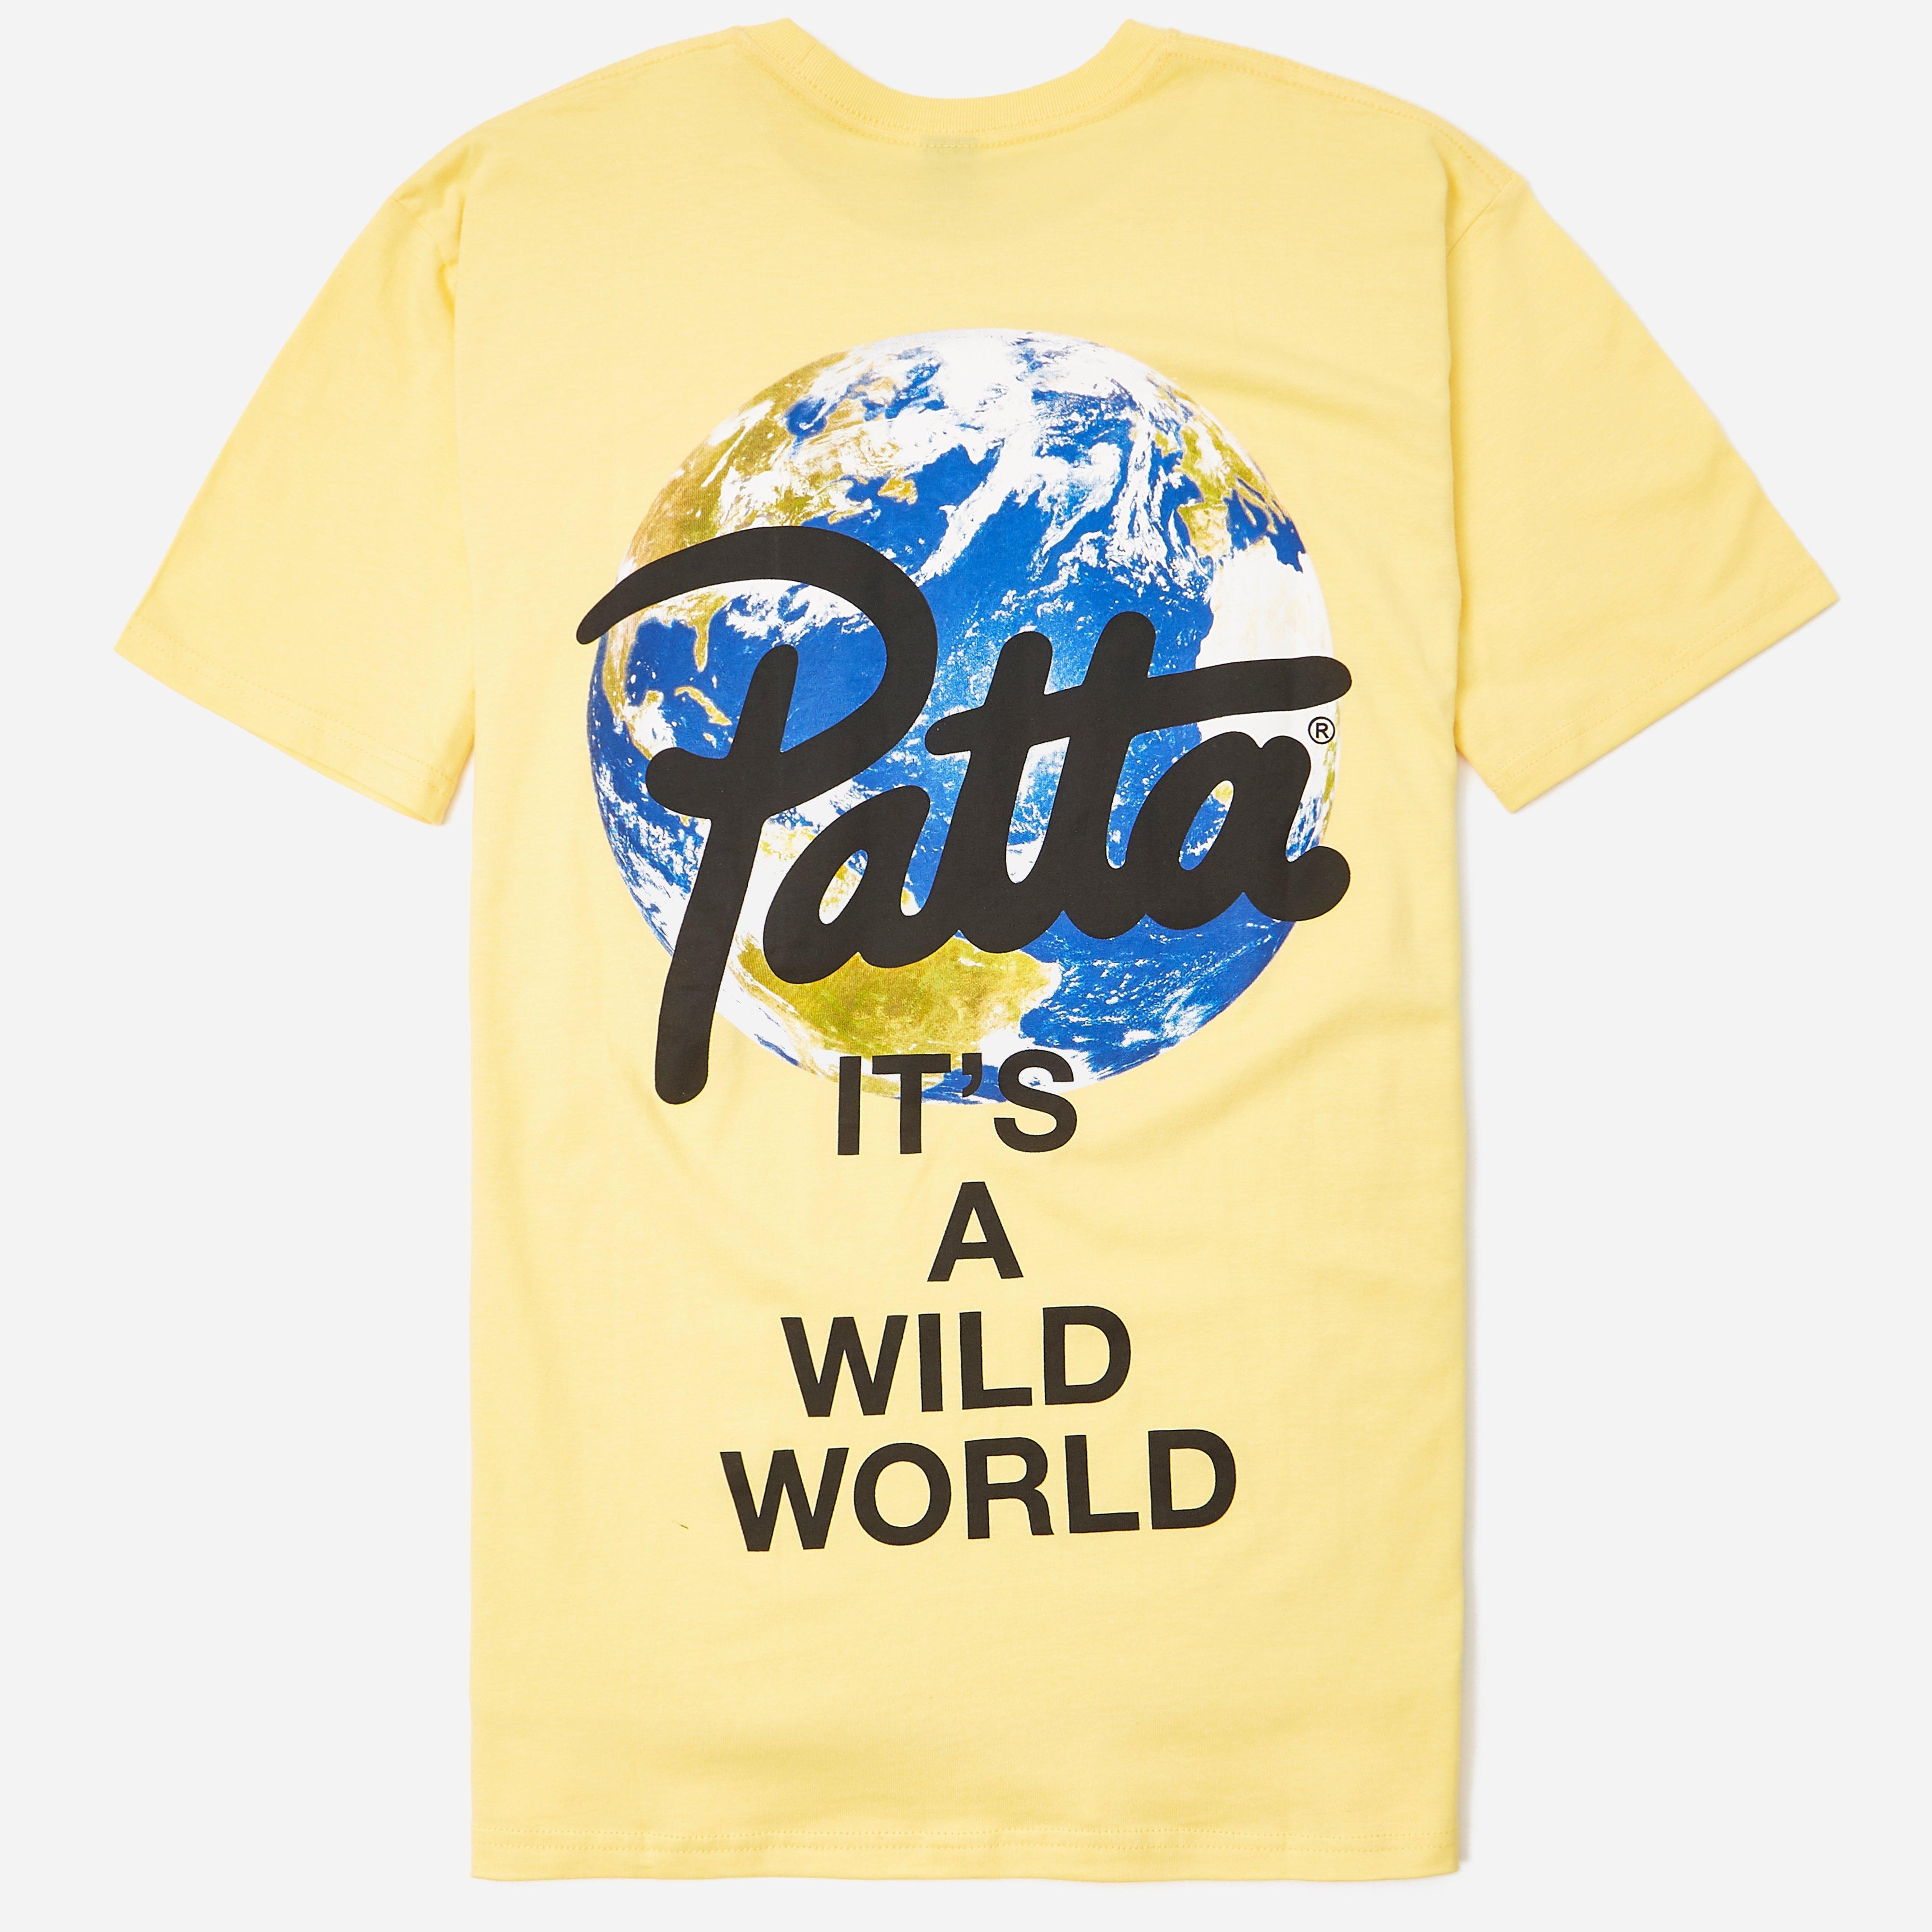 Patta Wild World T-shirt